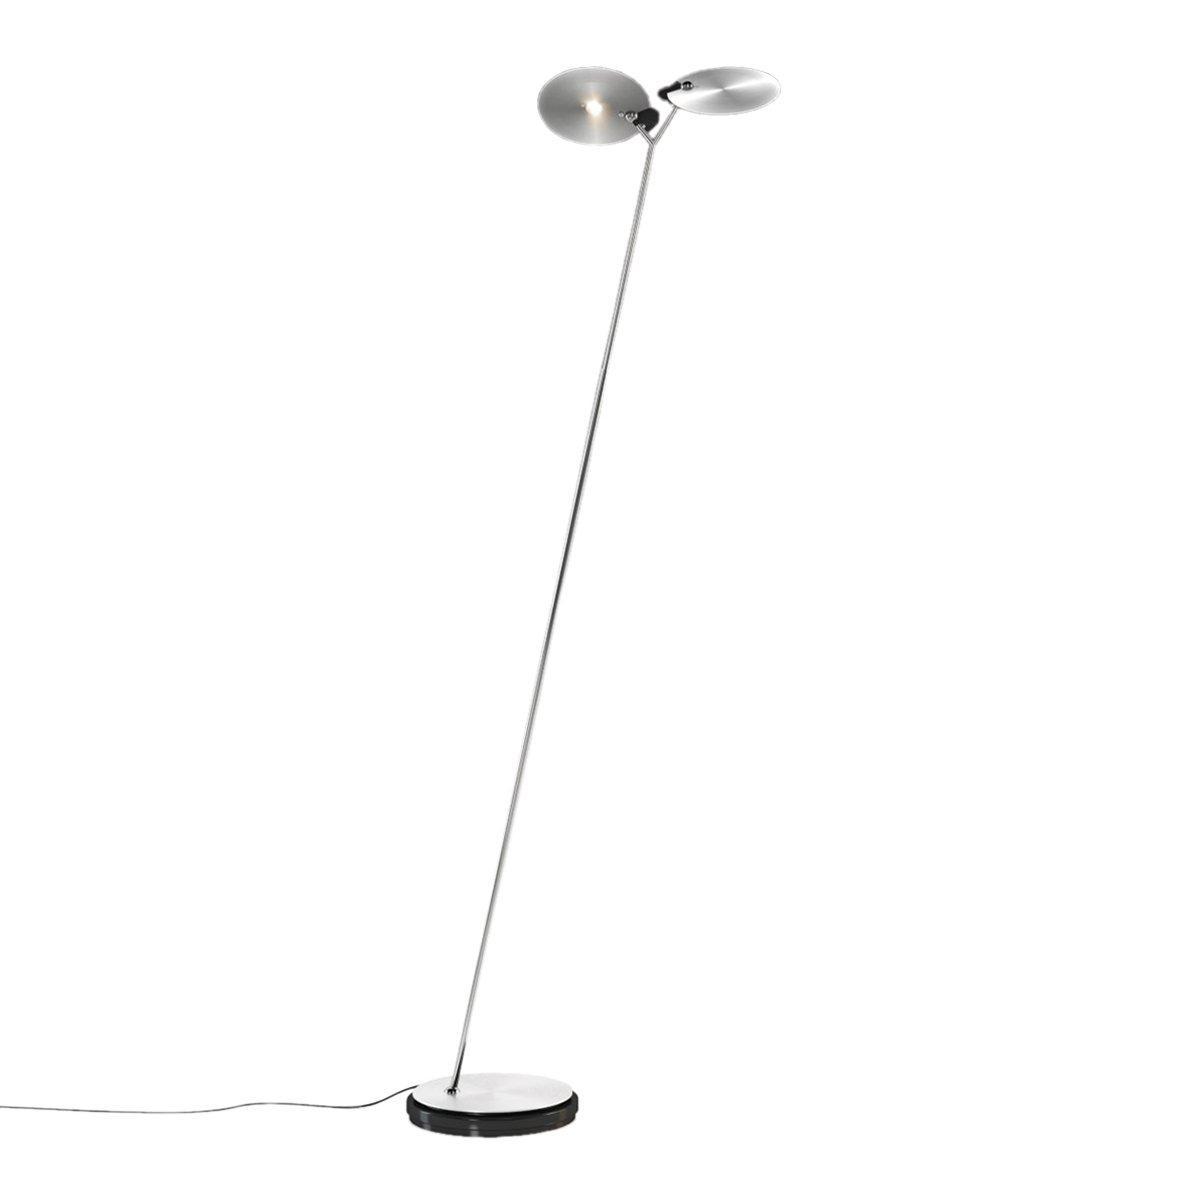 Baltensweiler OyO Vloerlamp Aluminium - 2700K